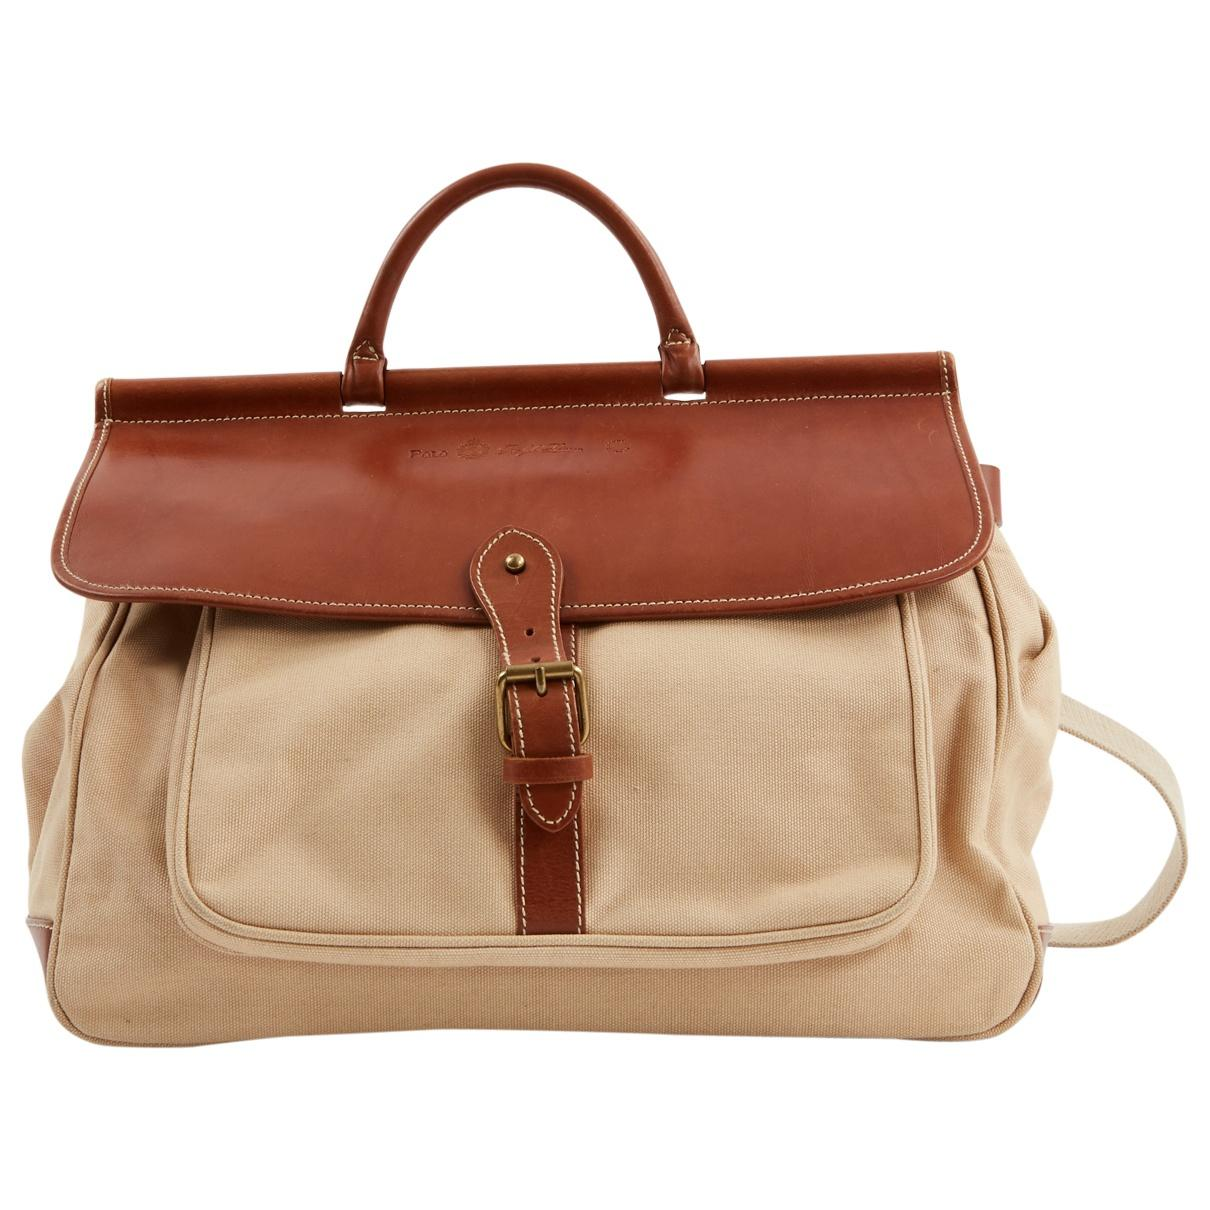 8b2e541700 Polo Ralph Lauren Pre-owned Beige Cloth Handbags in Natural - Lyst